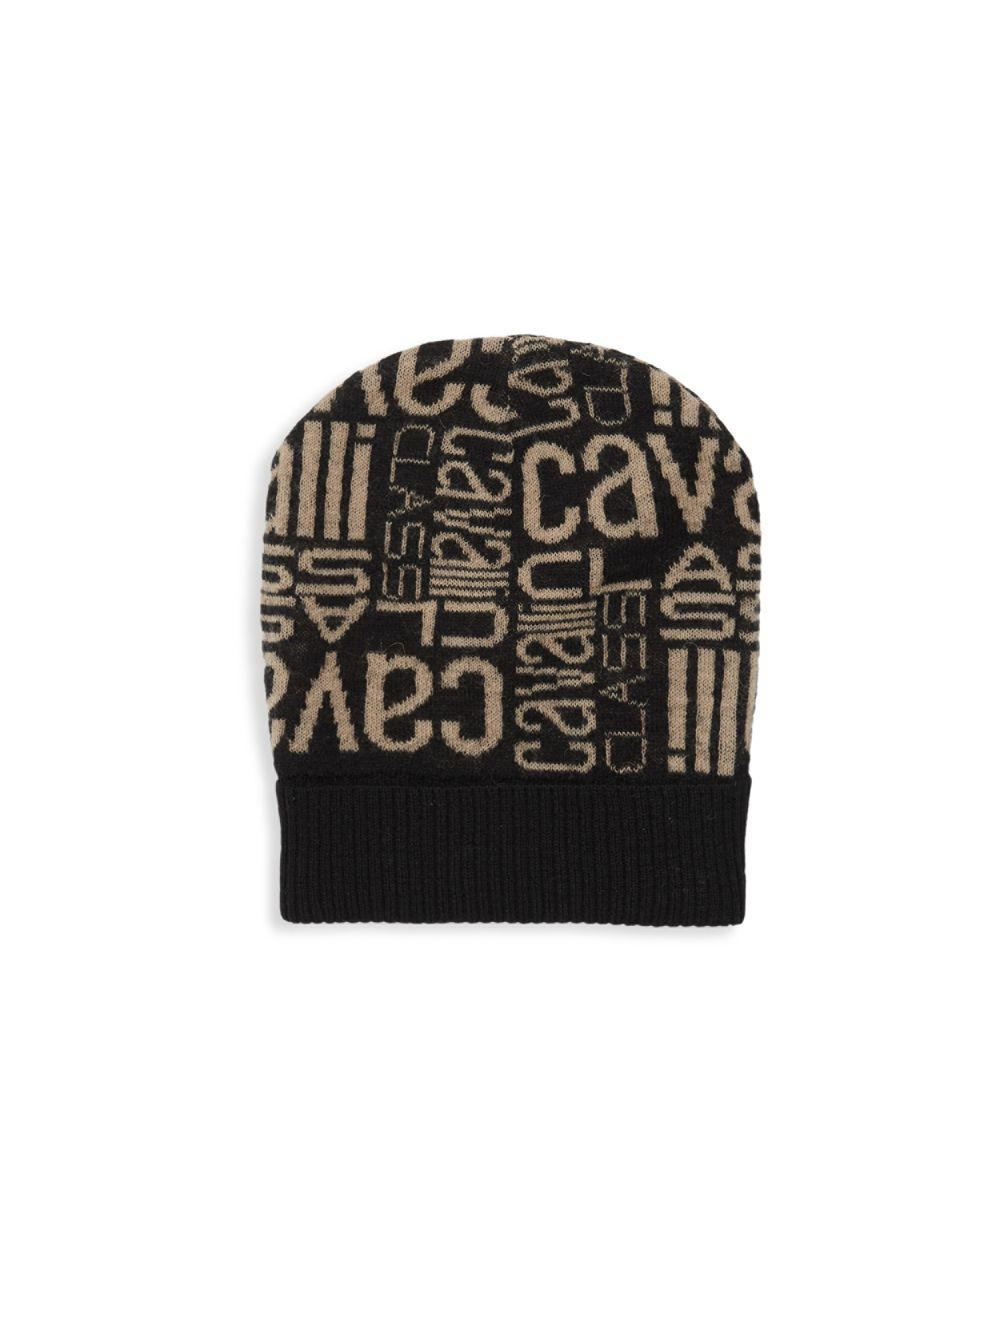 4de6bfbdfad Roberto Cavalli Logo Printed Hat in Black for Men - Lyst